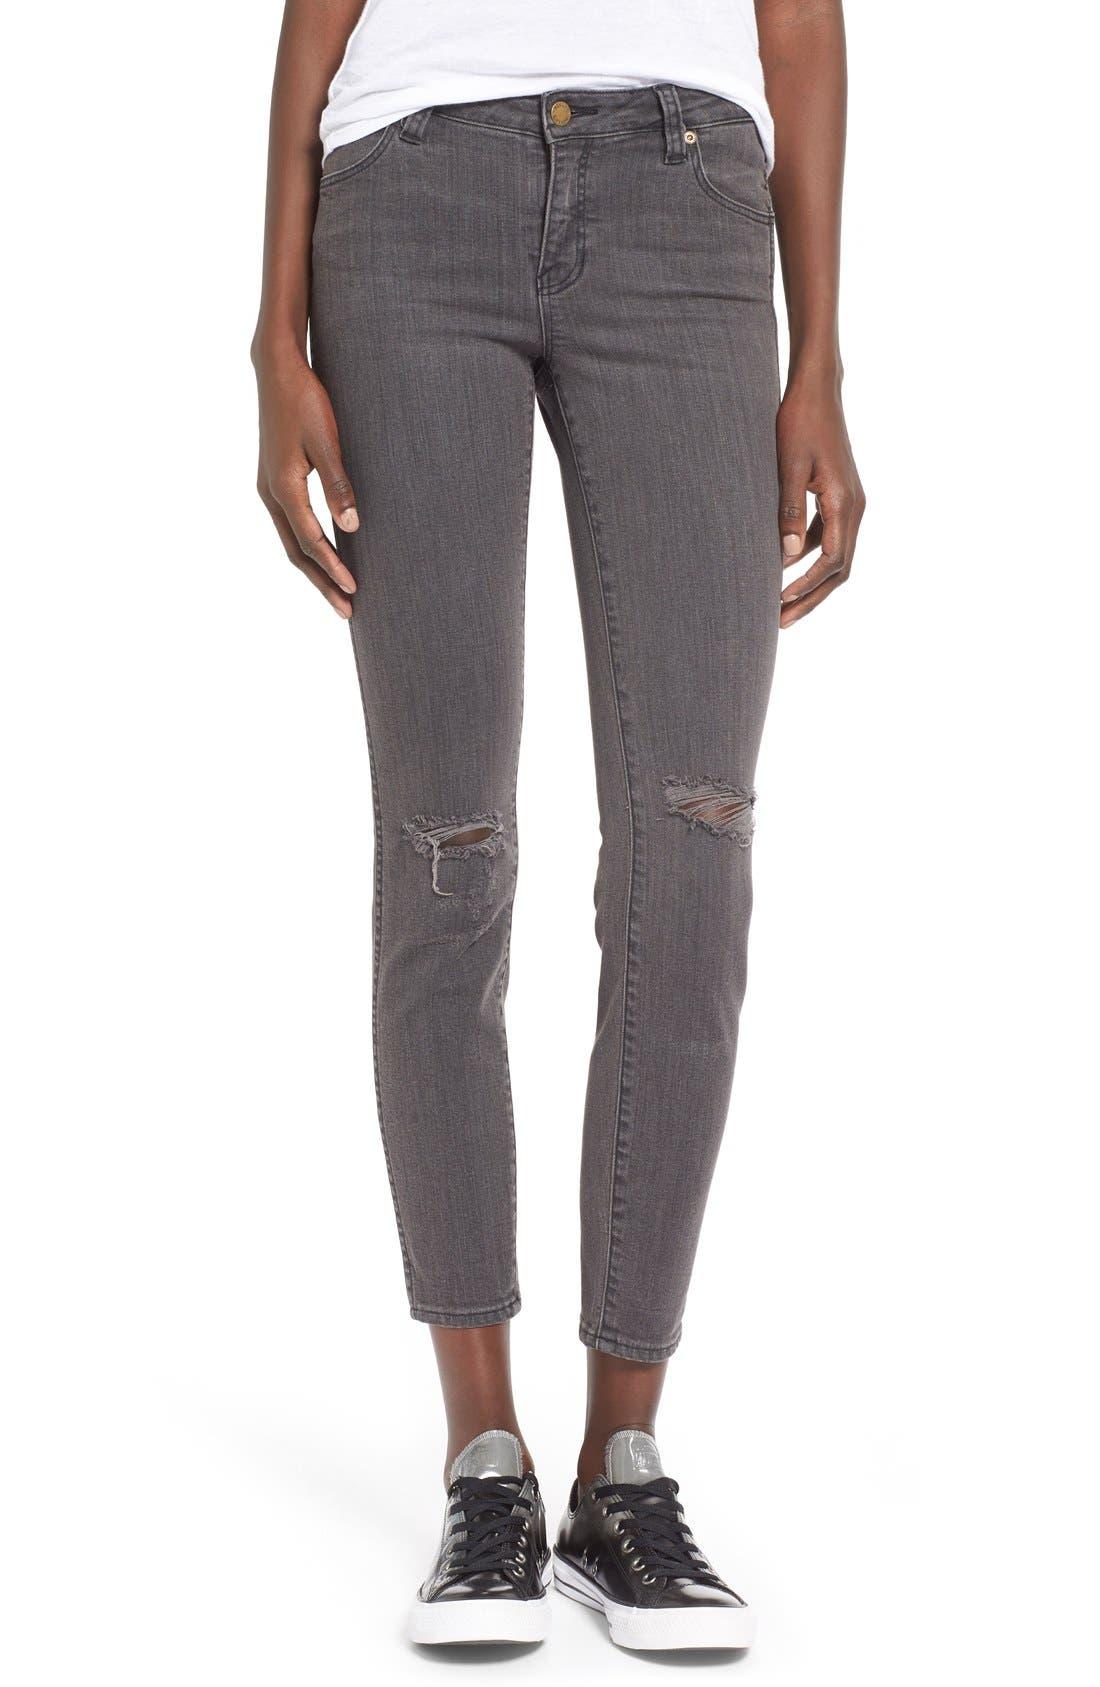 Main Image - Rolla's 'Breakers' Distressed Skinny Jeans (Beaten Black)